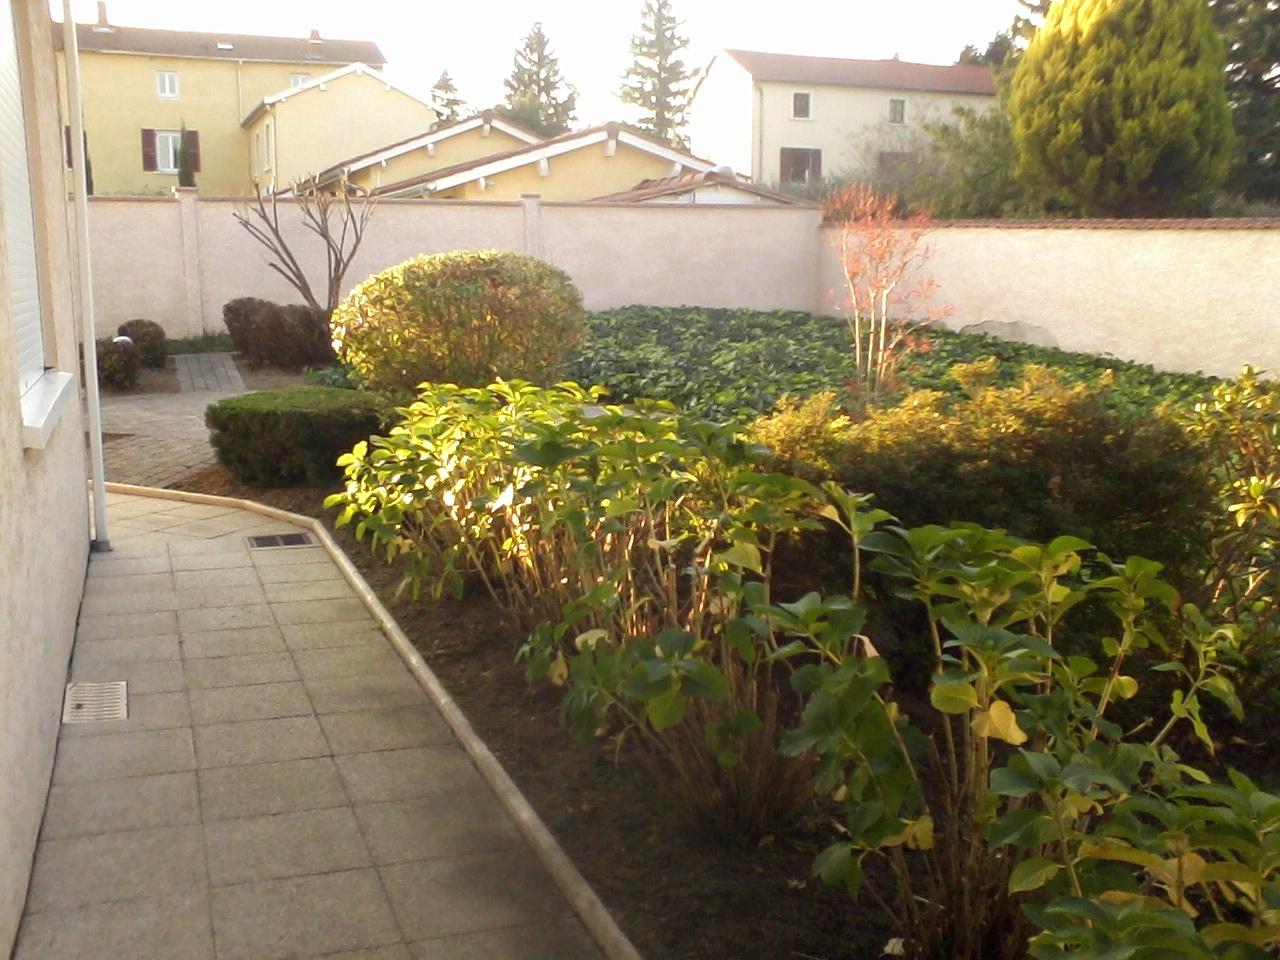 1000 et un jardins paysagiste lyon. Black Bedroom Furniture Sets. Home Design Ideas